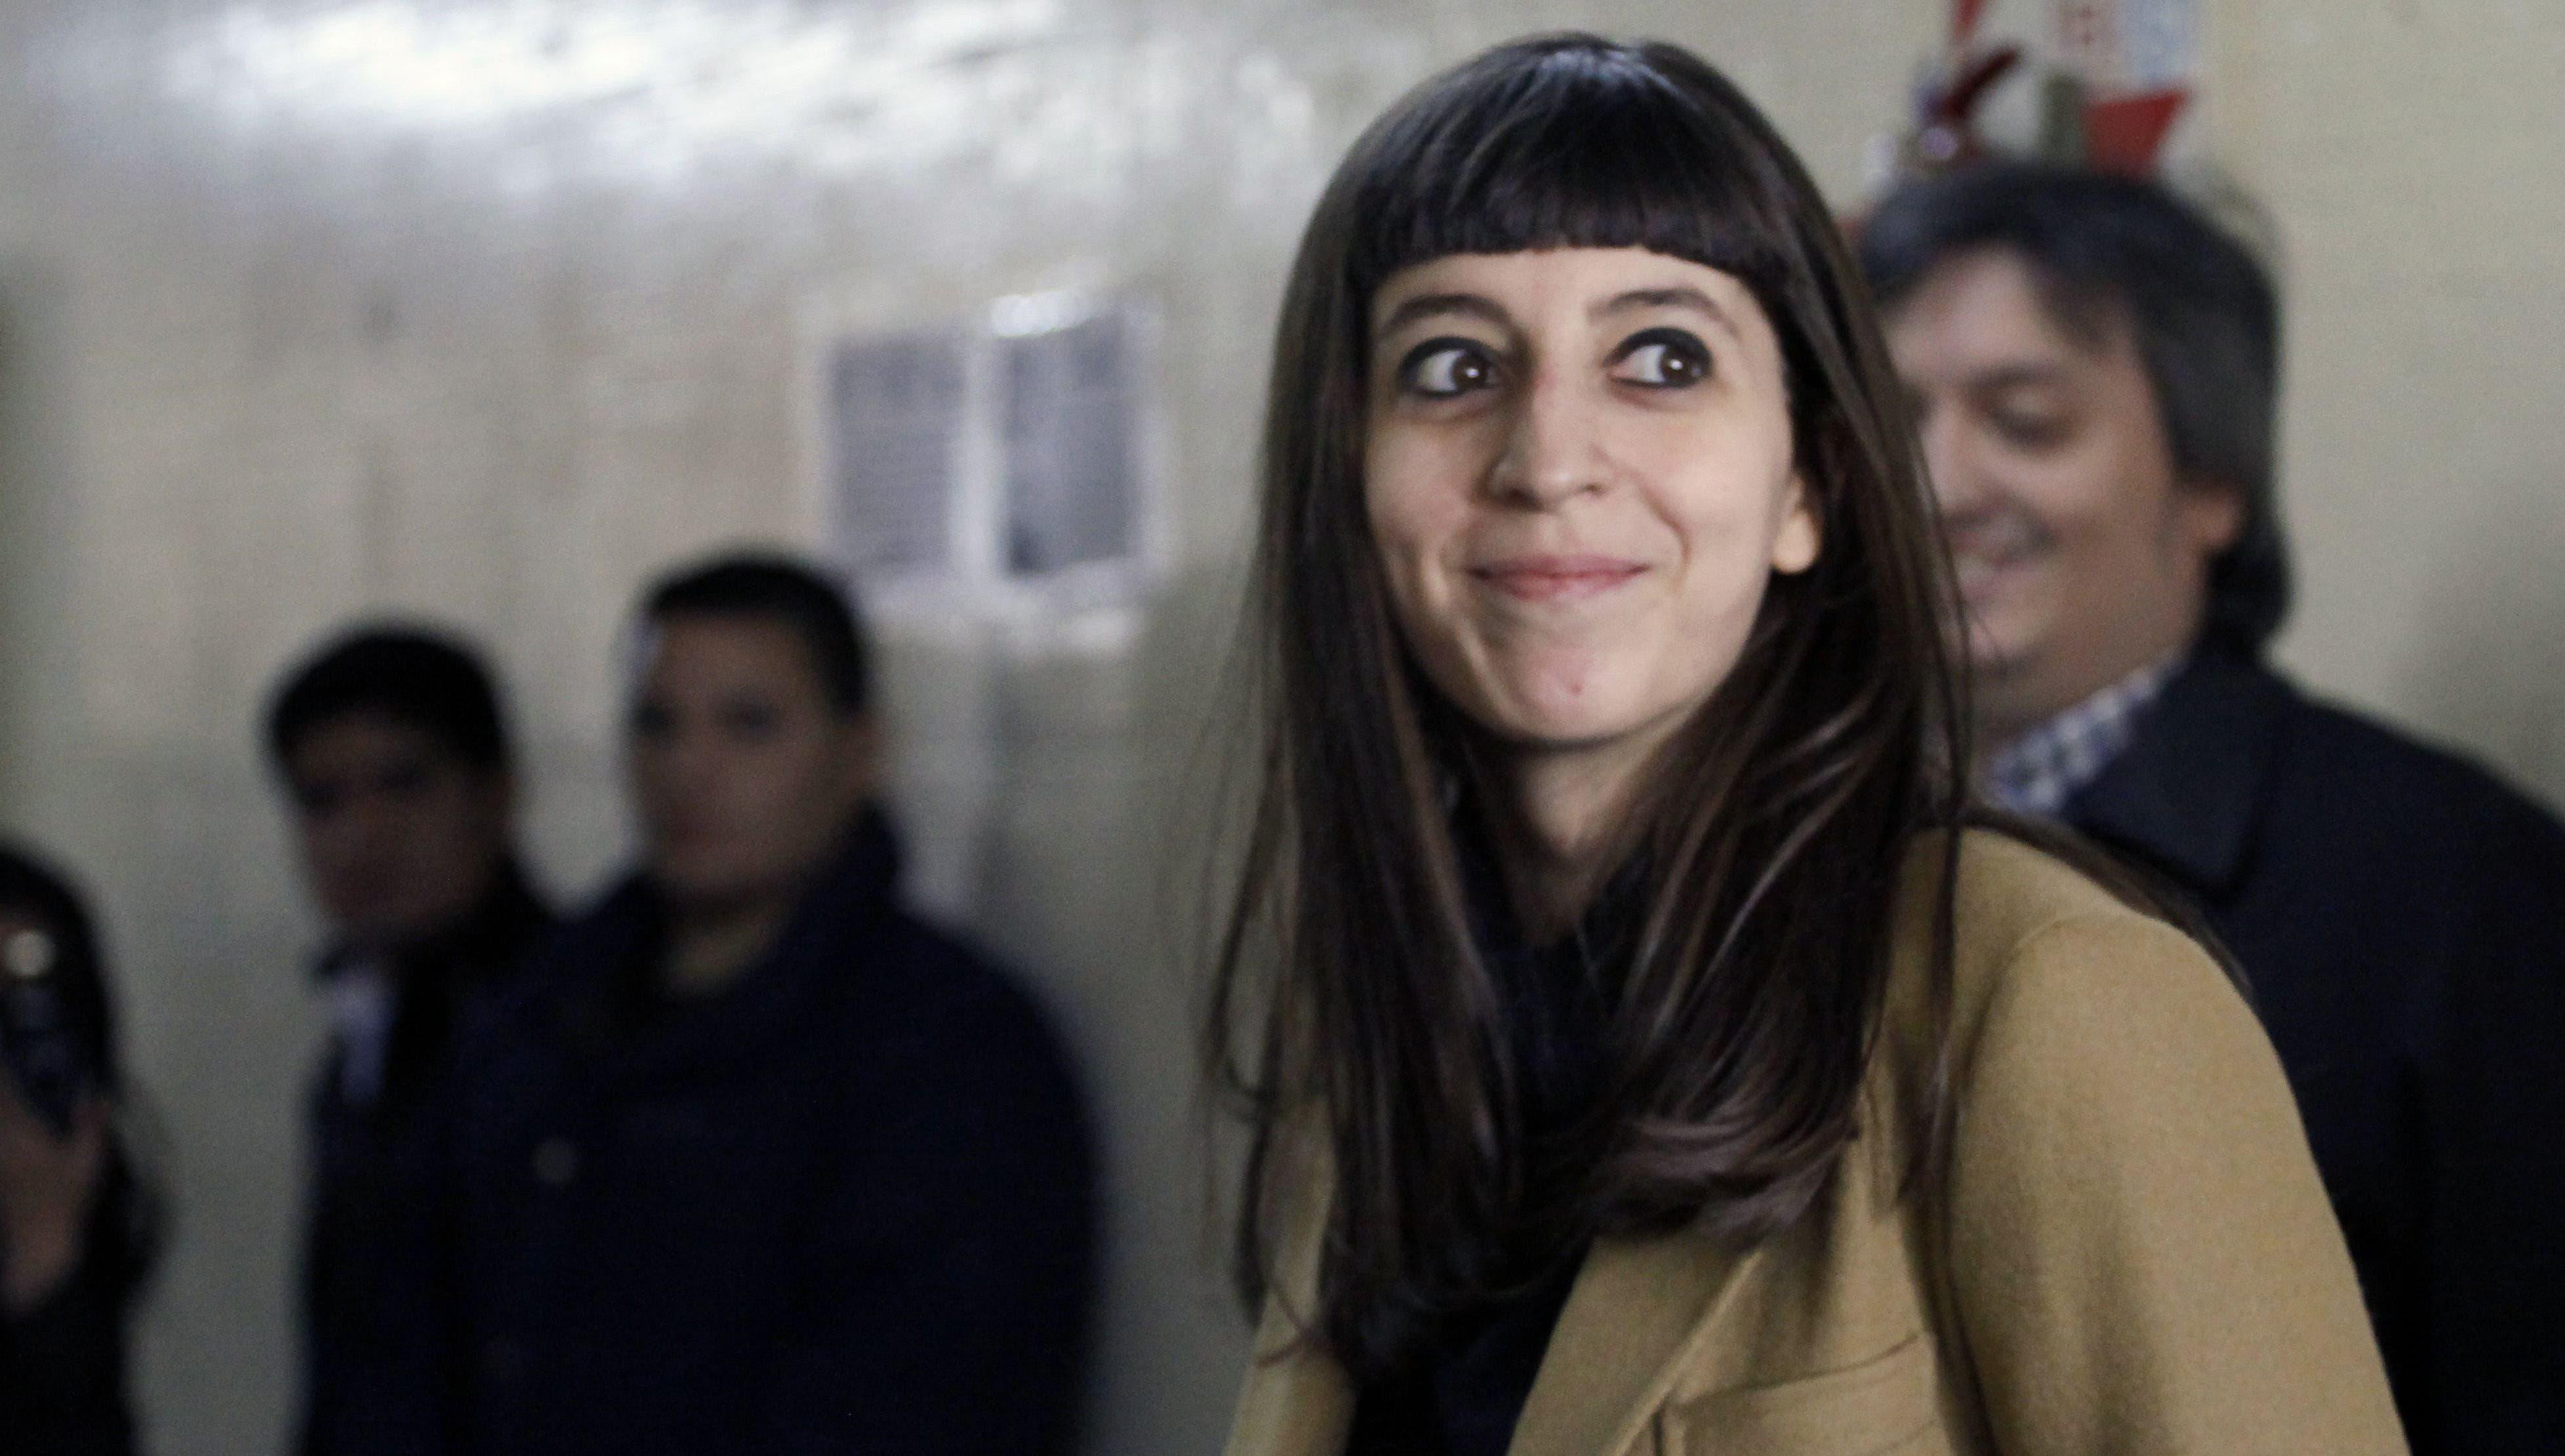 Florencia Kirchner Busca Que Le Levanten El Embargo Con